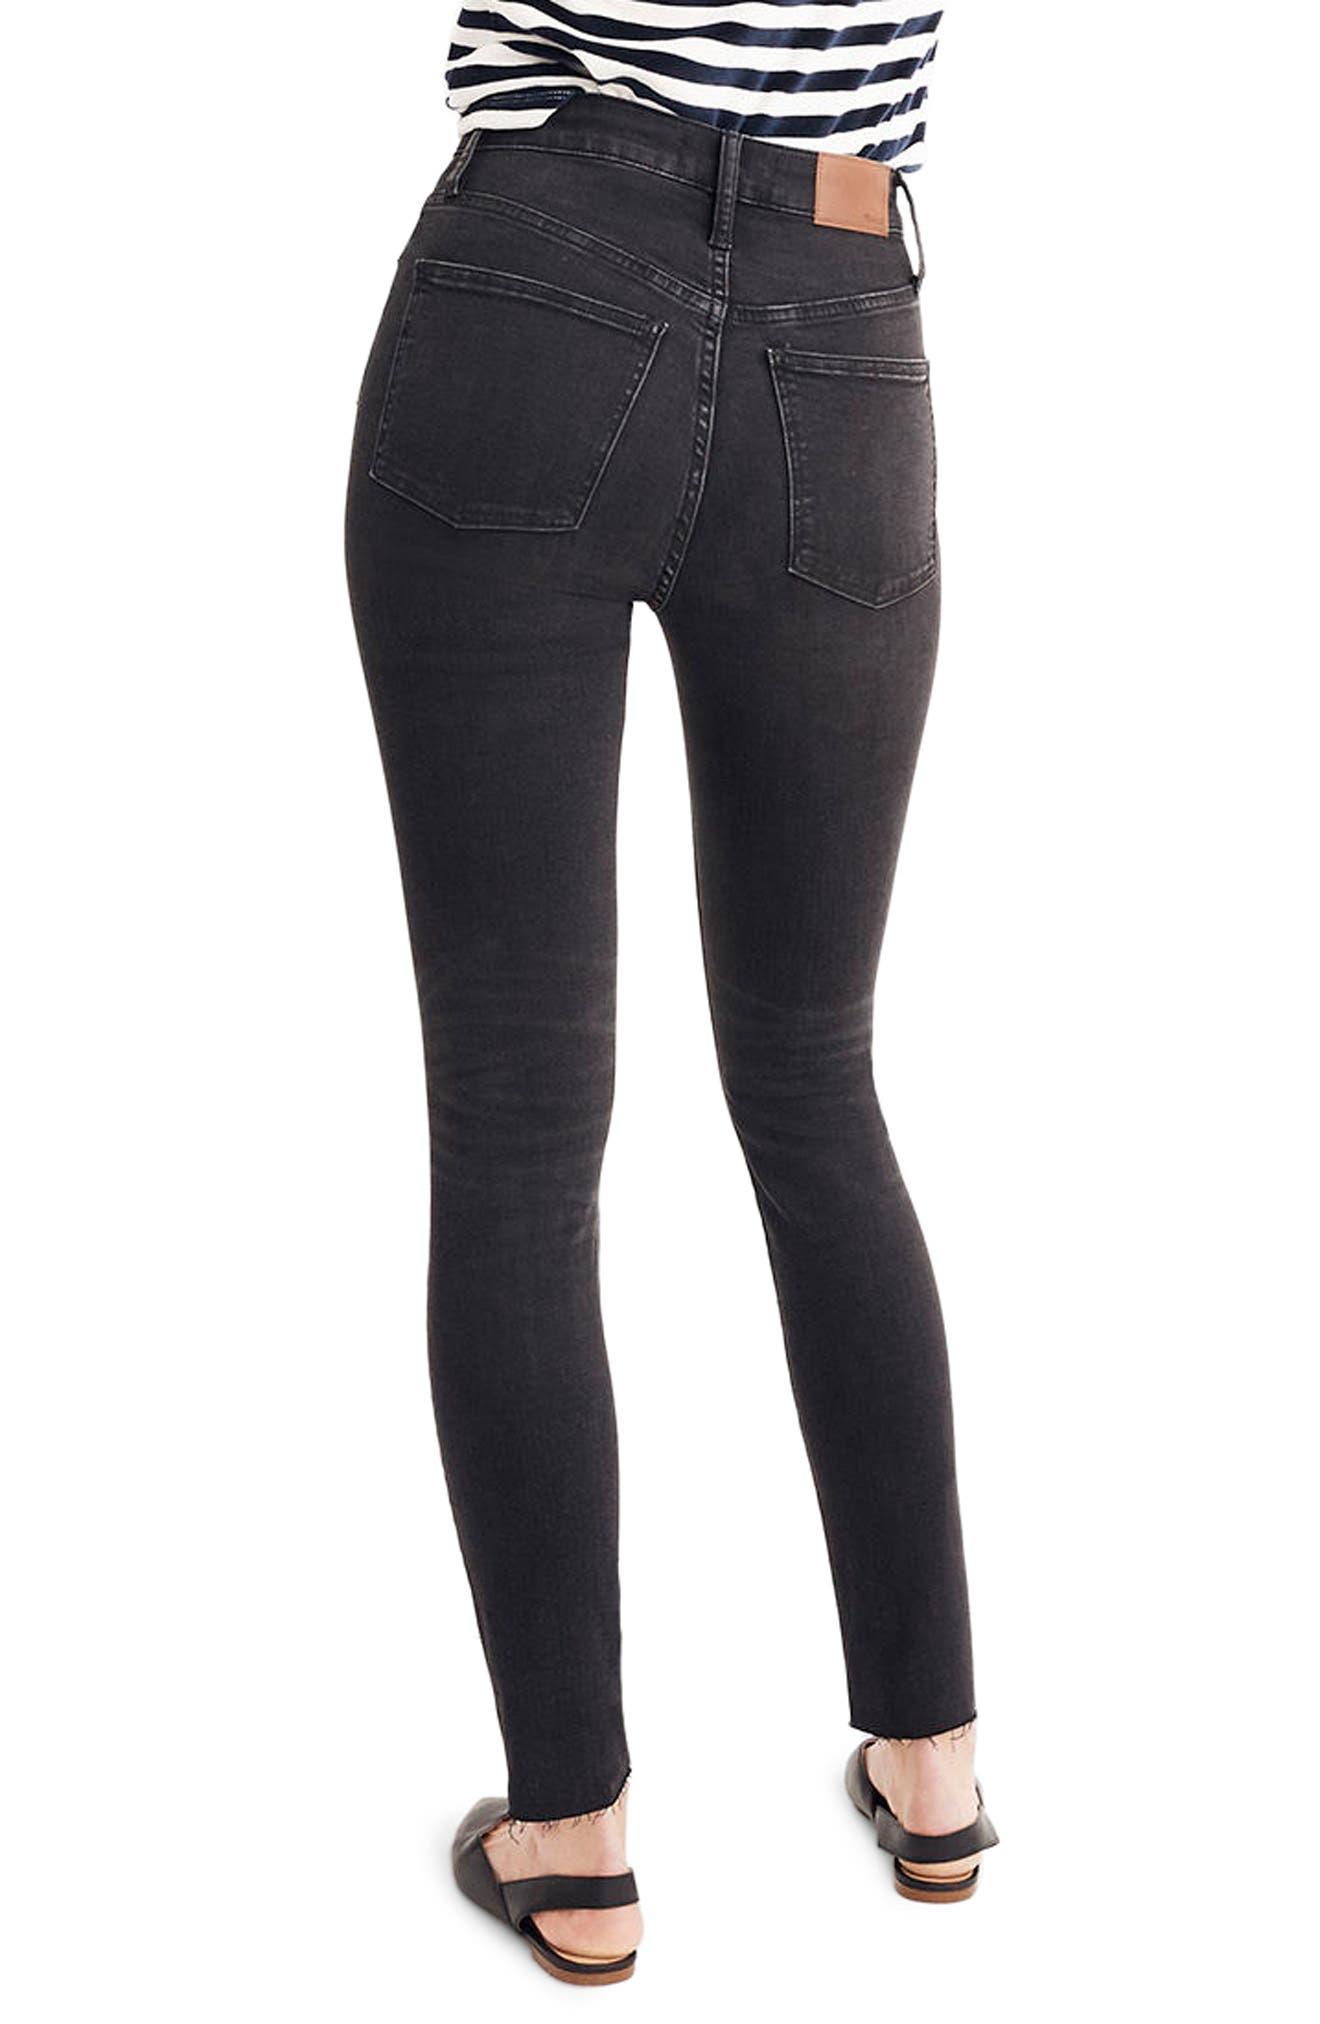 Curvy High Waist Skinny Jeans,                             Alternate thumbnail 2, color,                             Black Sea